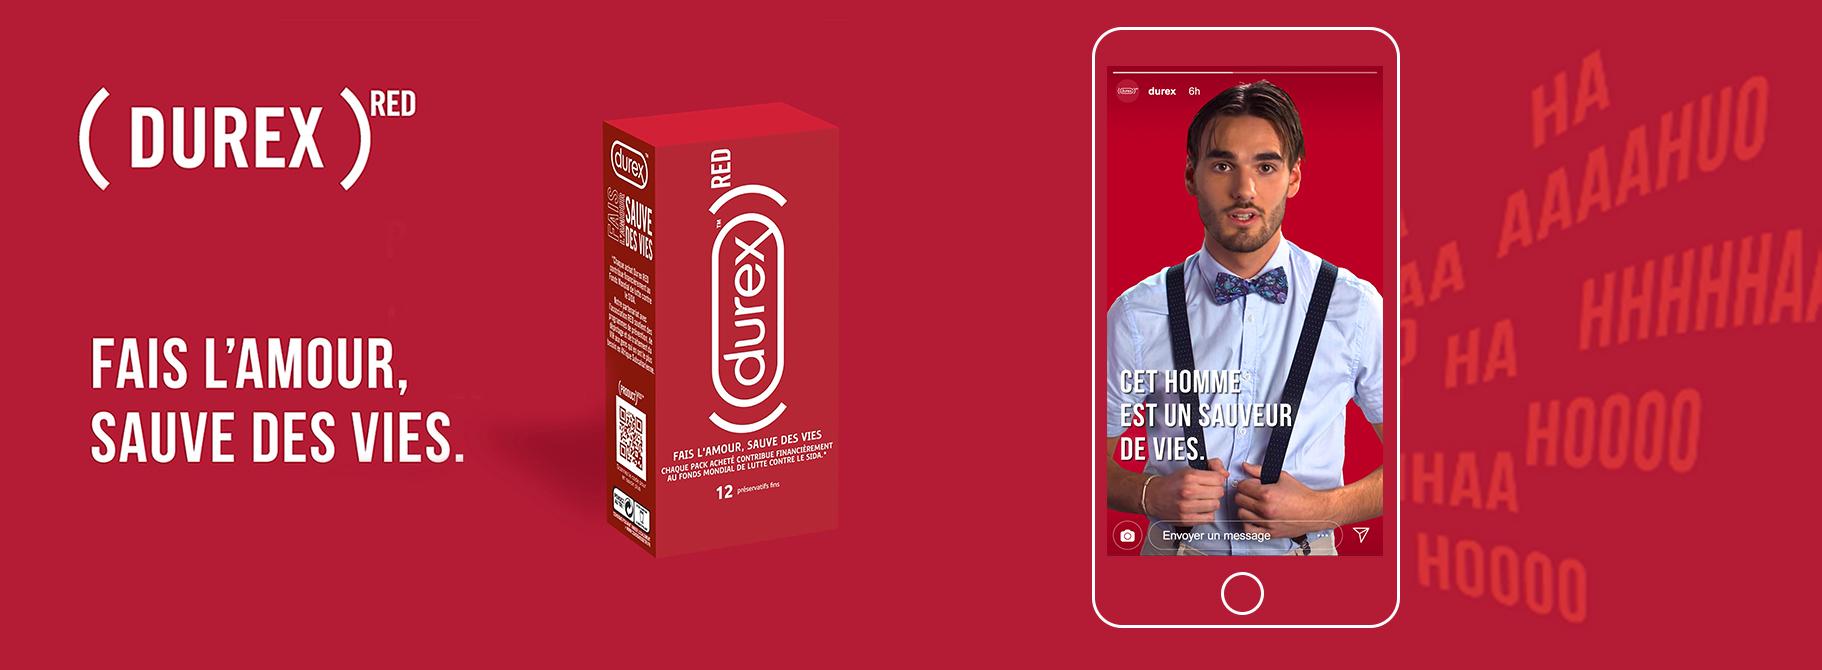 agence digital santé health by agency Durex RED